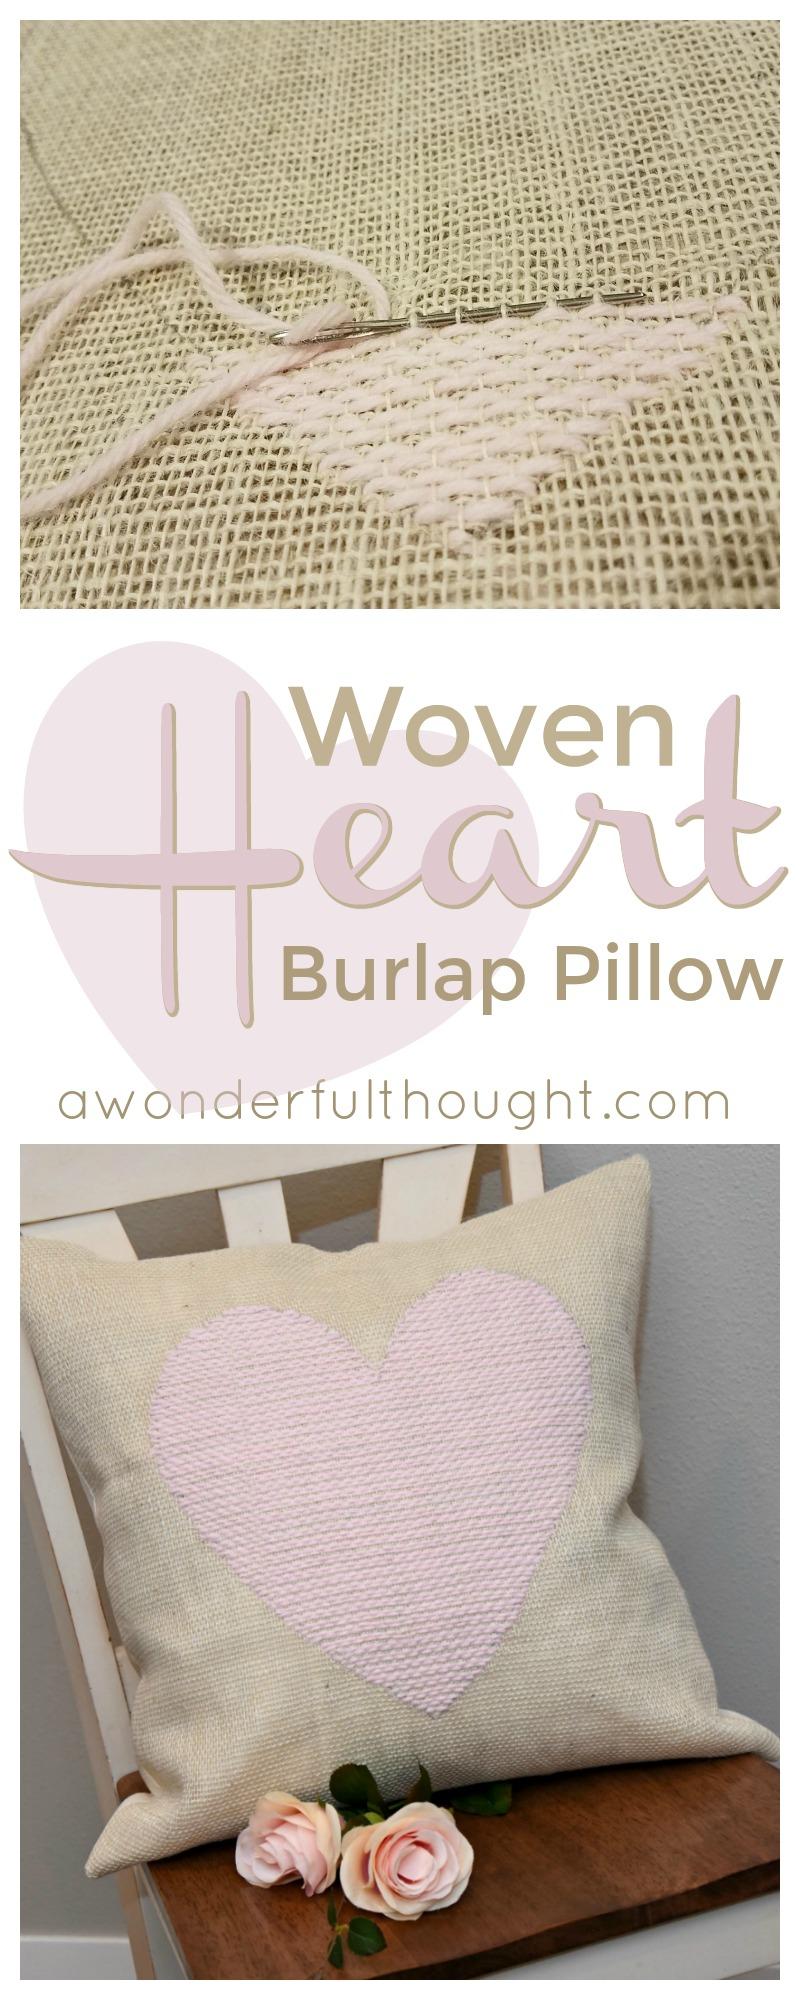 diy woven heart burlap pillow